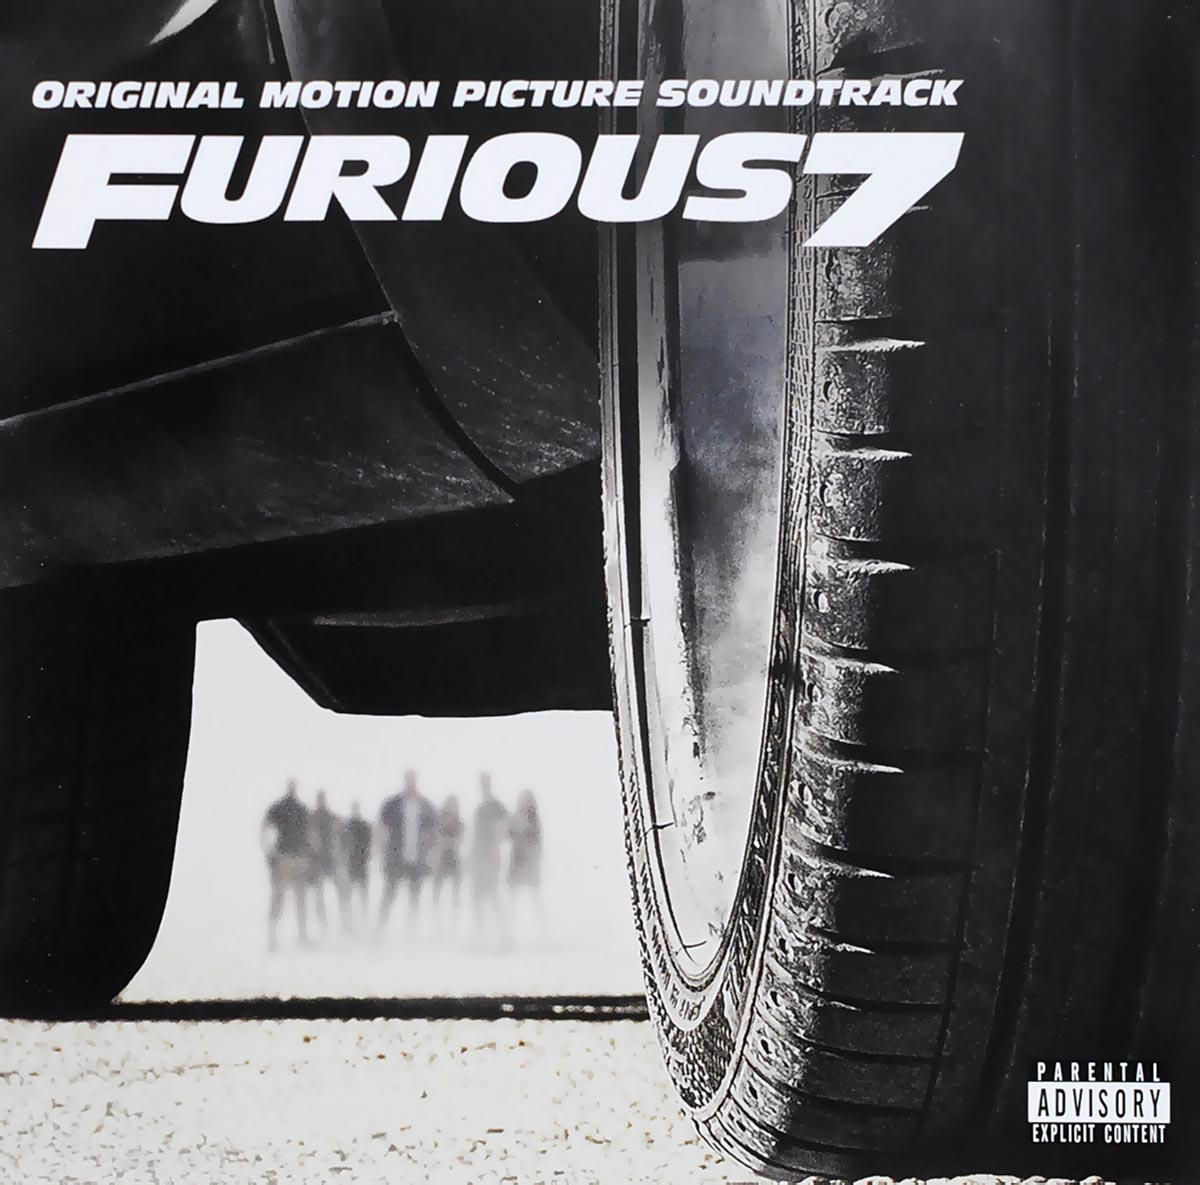 Furious 7. Original Motion Picture Soundtrack